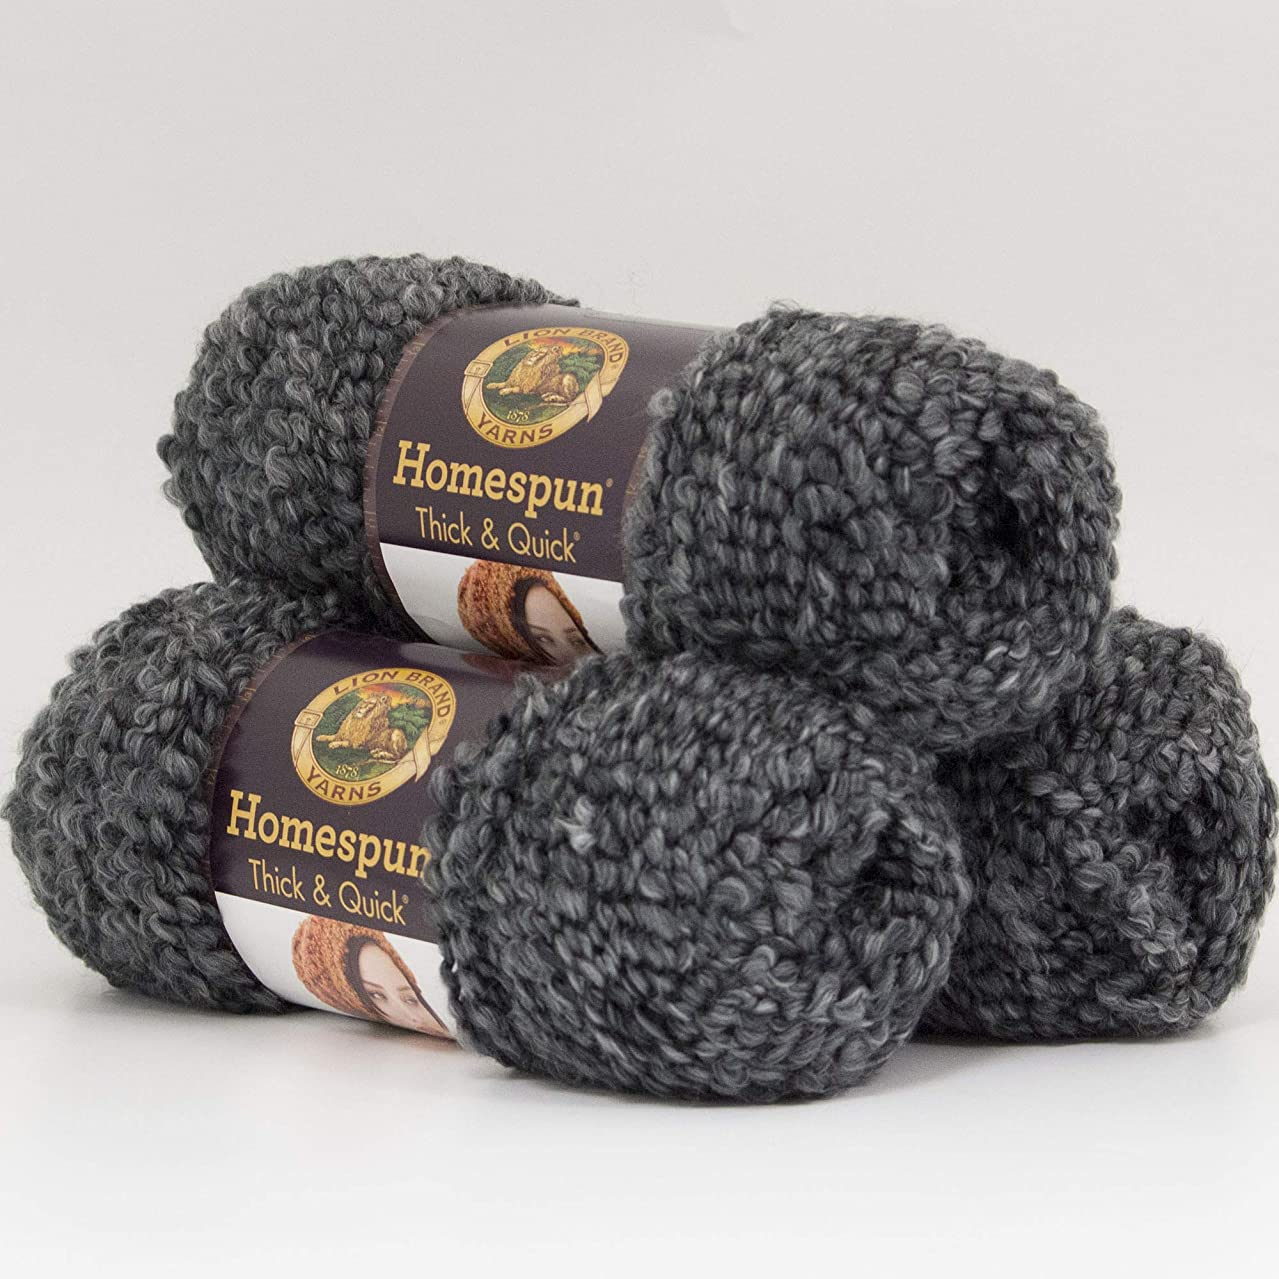 (3 Pack) Lion Brand Yarn 792-312 Homespun Thick and Quick Yarn, Edwardian